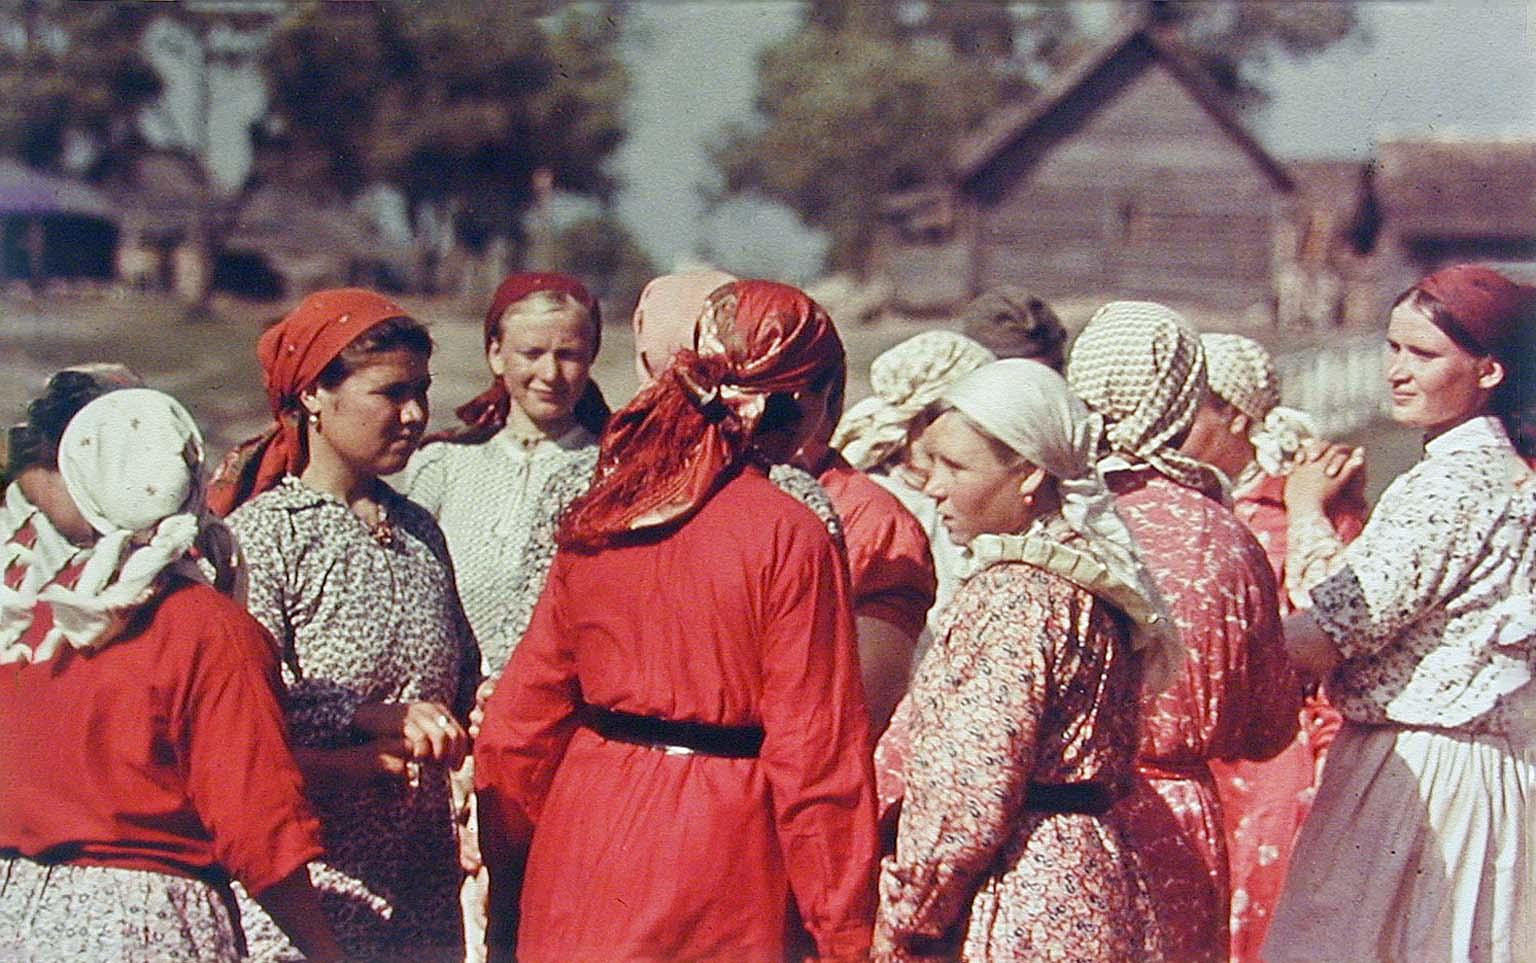 Soviet peasant